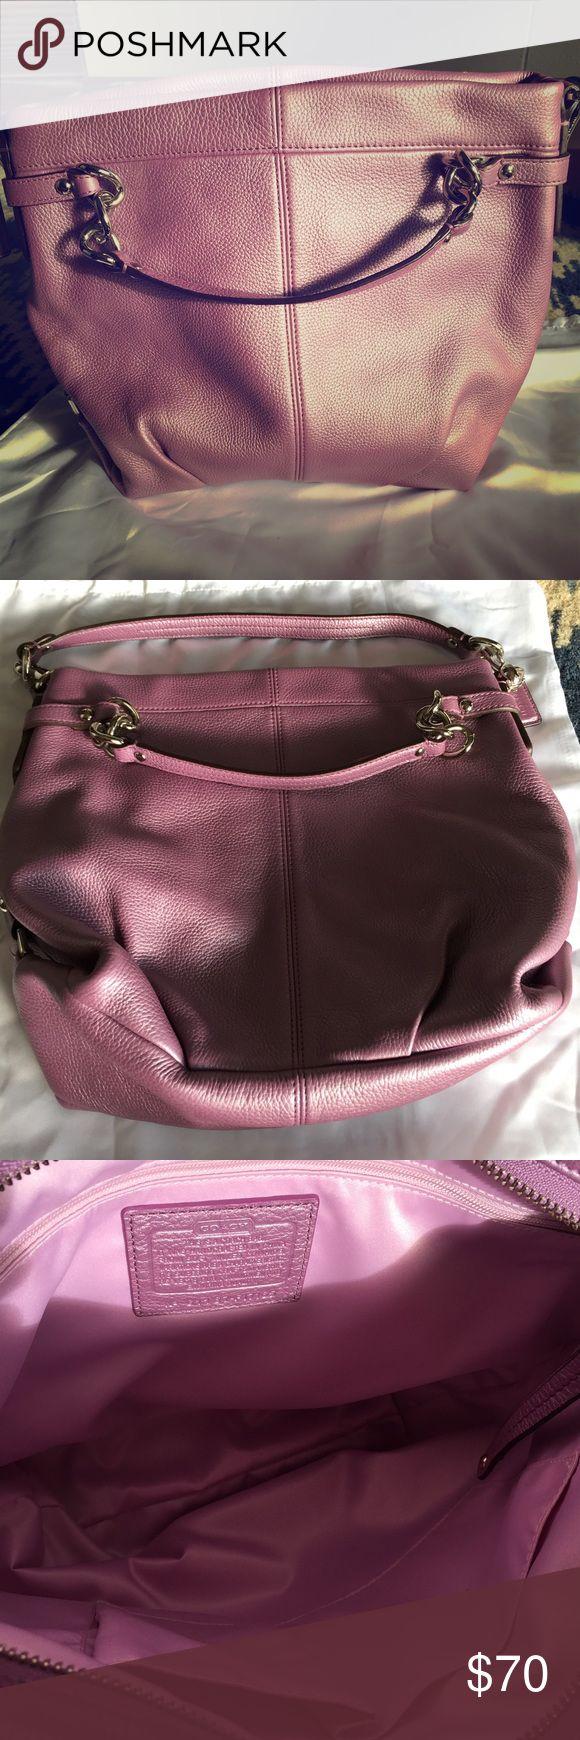 Coach hobo bag 👛 Very cute Coach, like new, hobo.  I used it once!! Coach Bags Hobos